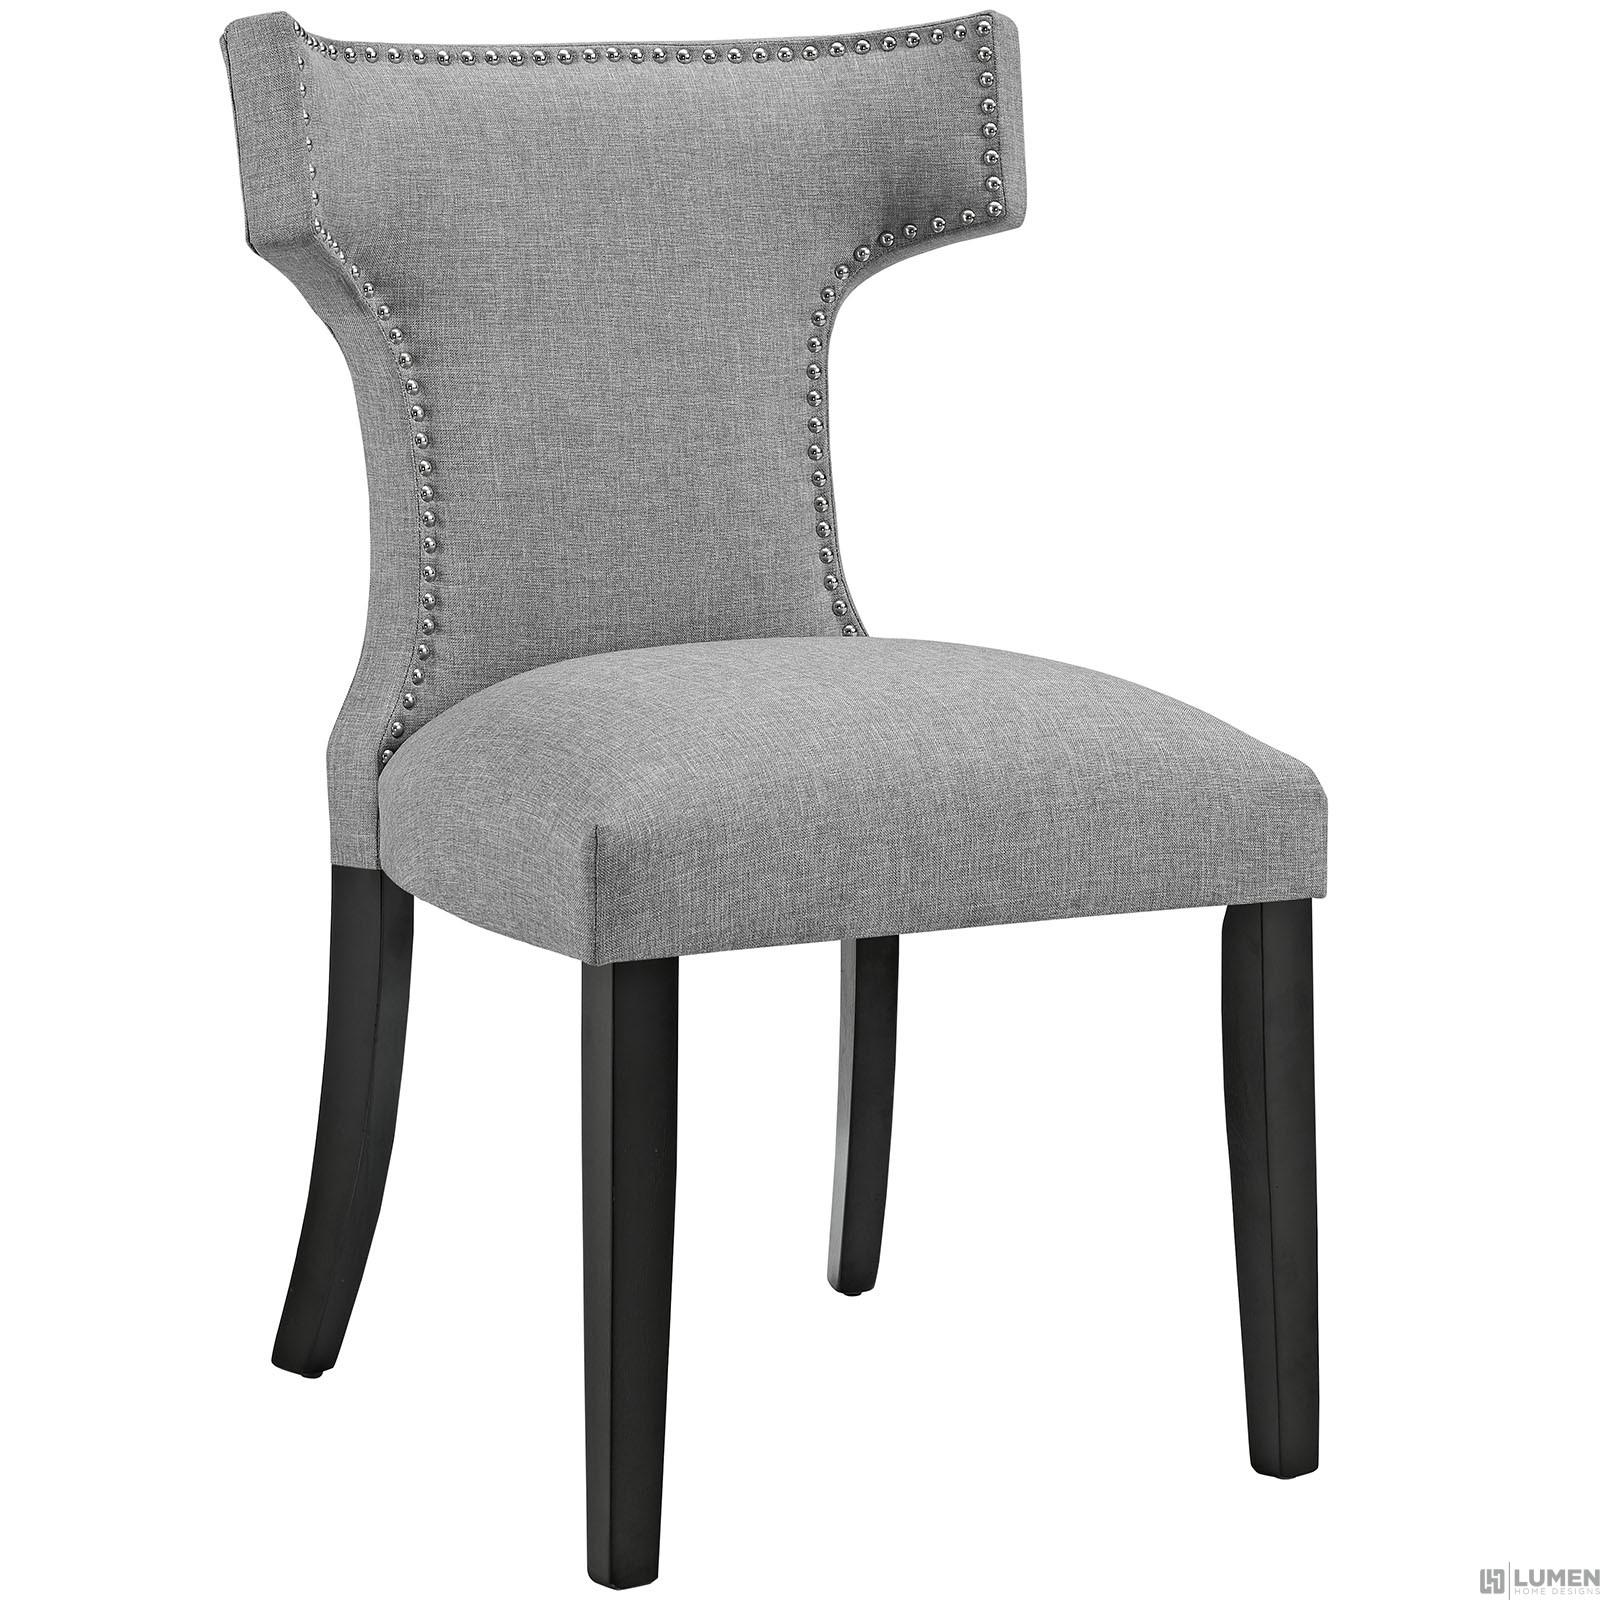 LHD-2221-LGR-Dining Chair